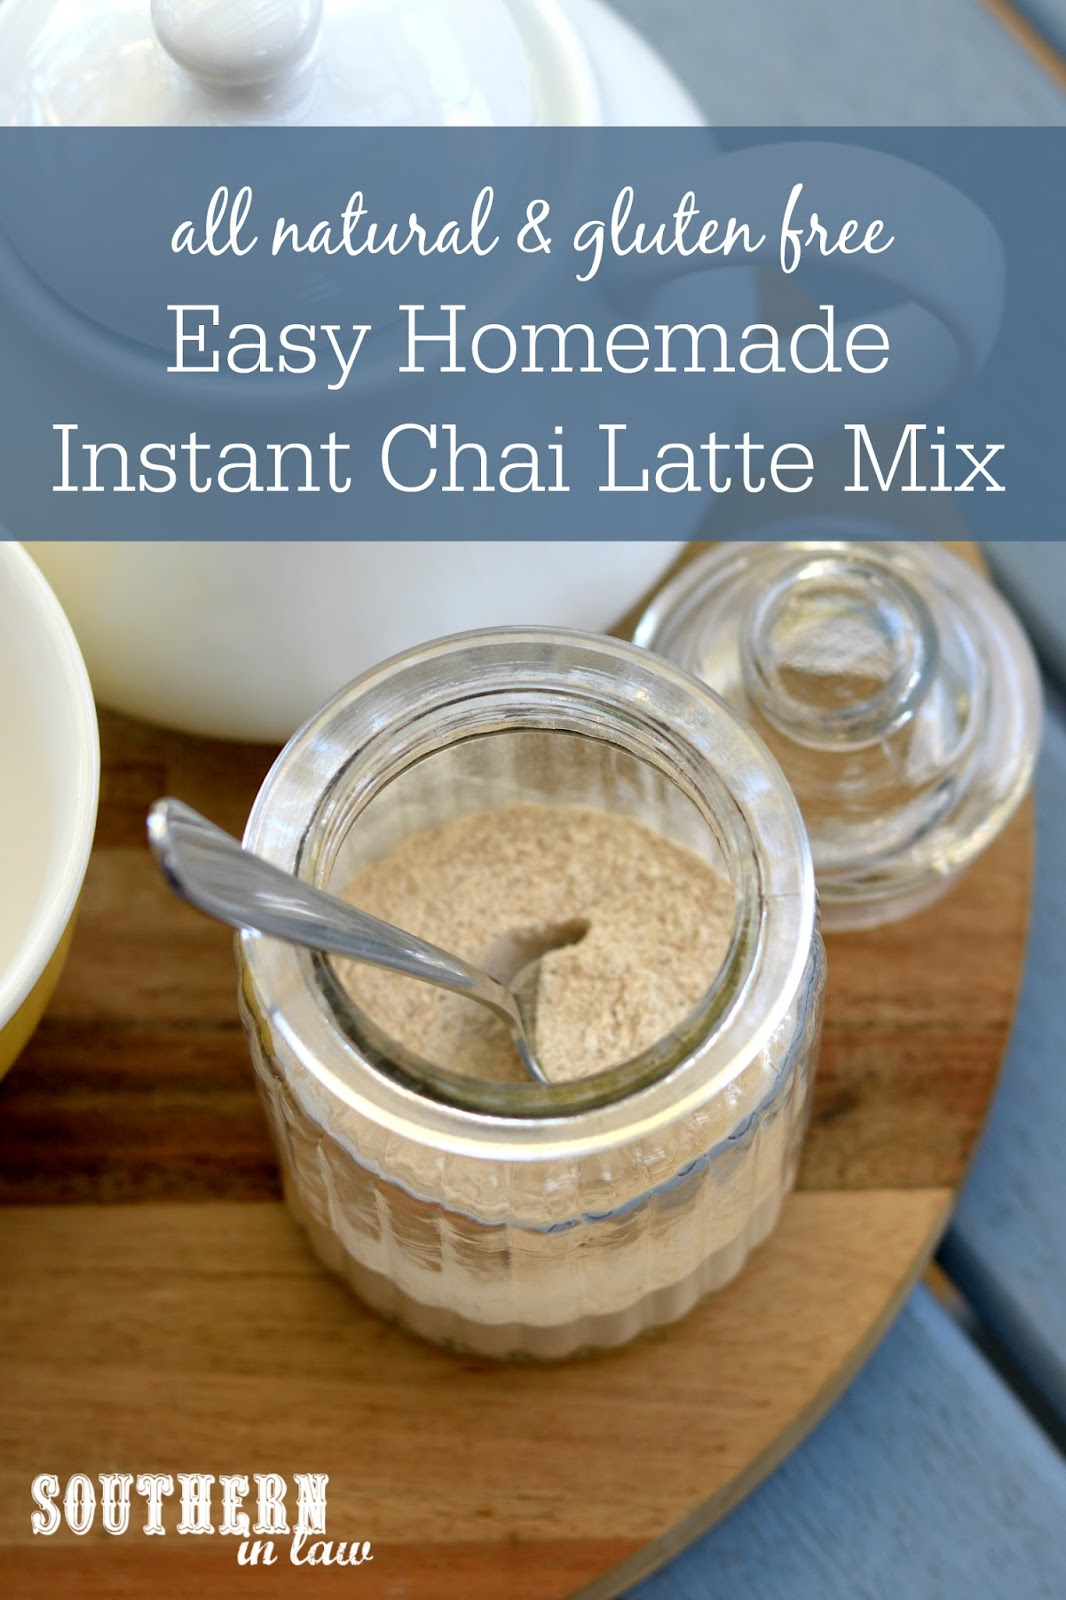 Easy DIY Instant Chai Latte Mix Recipe - gluten free, paleo, vegan, healthy